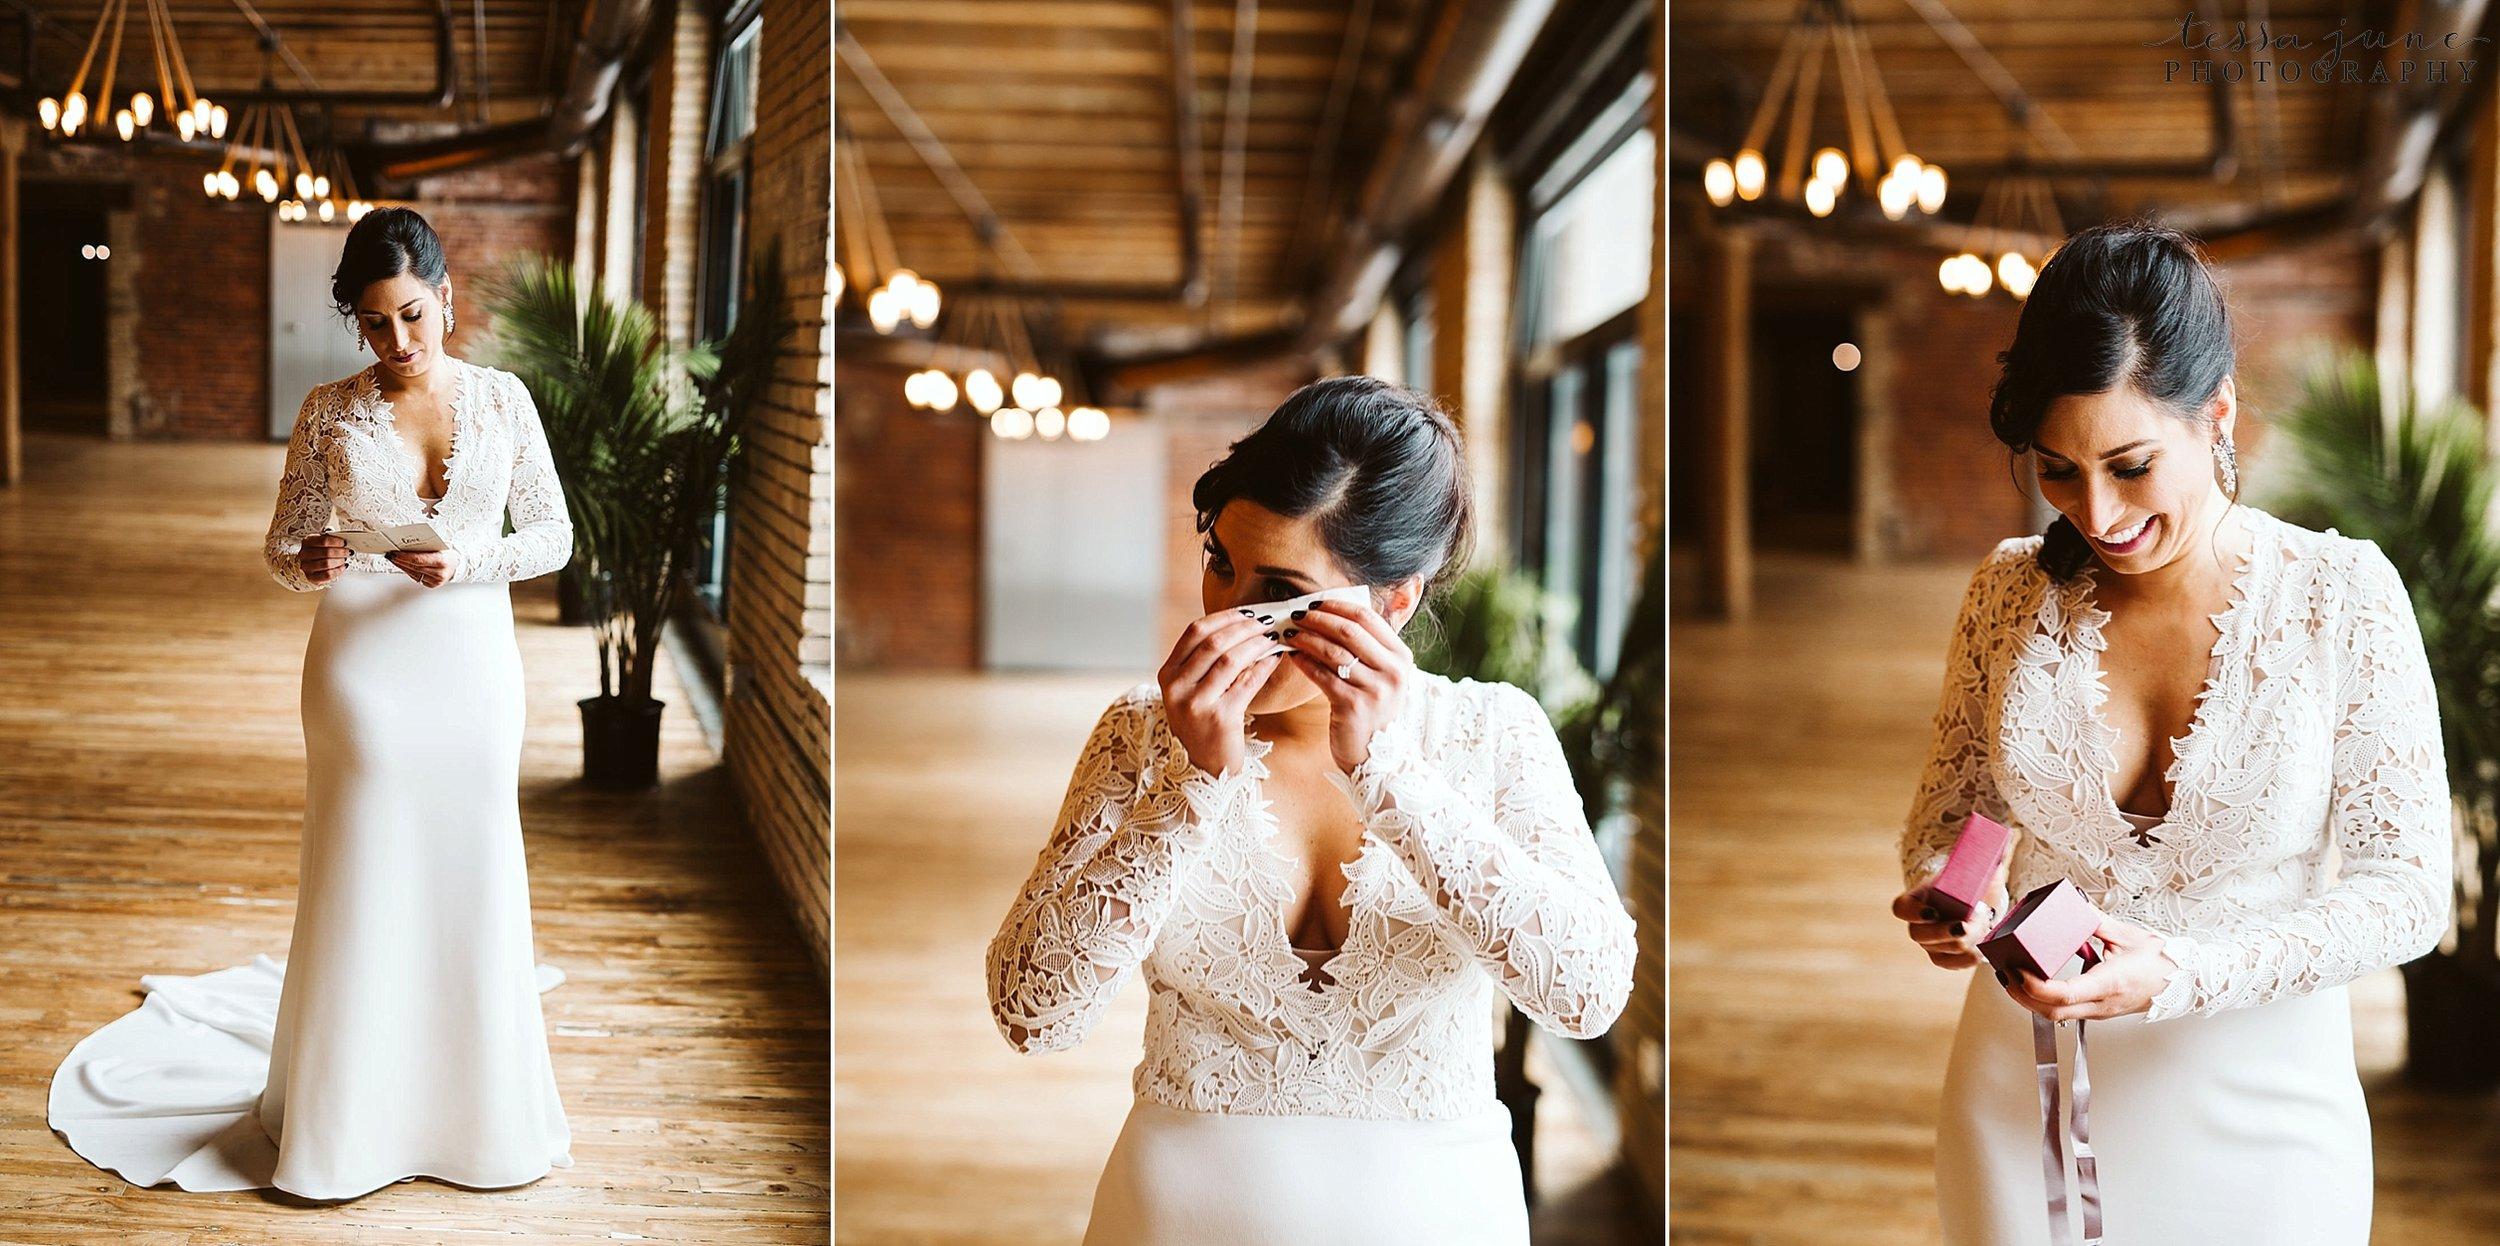 minneapolis-event-center-winter-romantic-snow-wedding-december-48.jpg